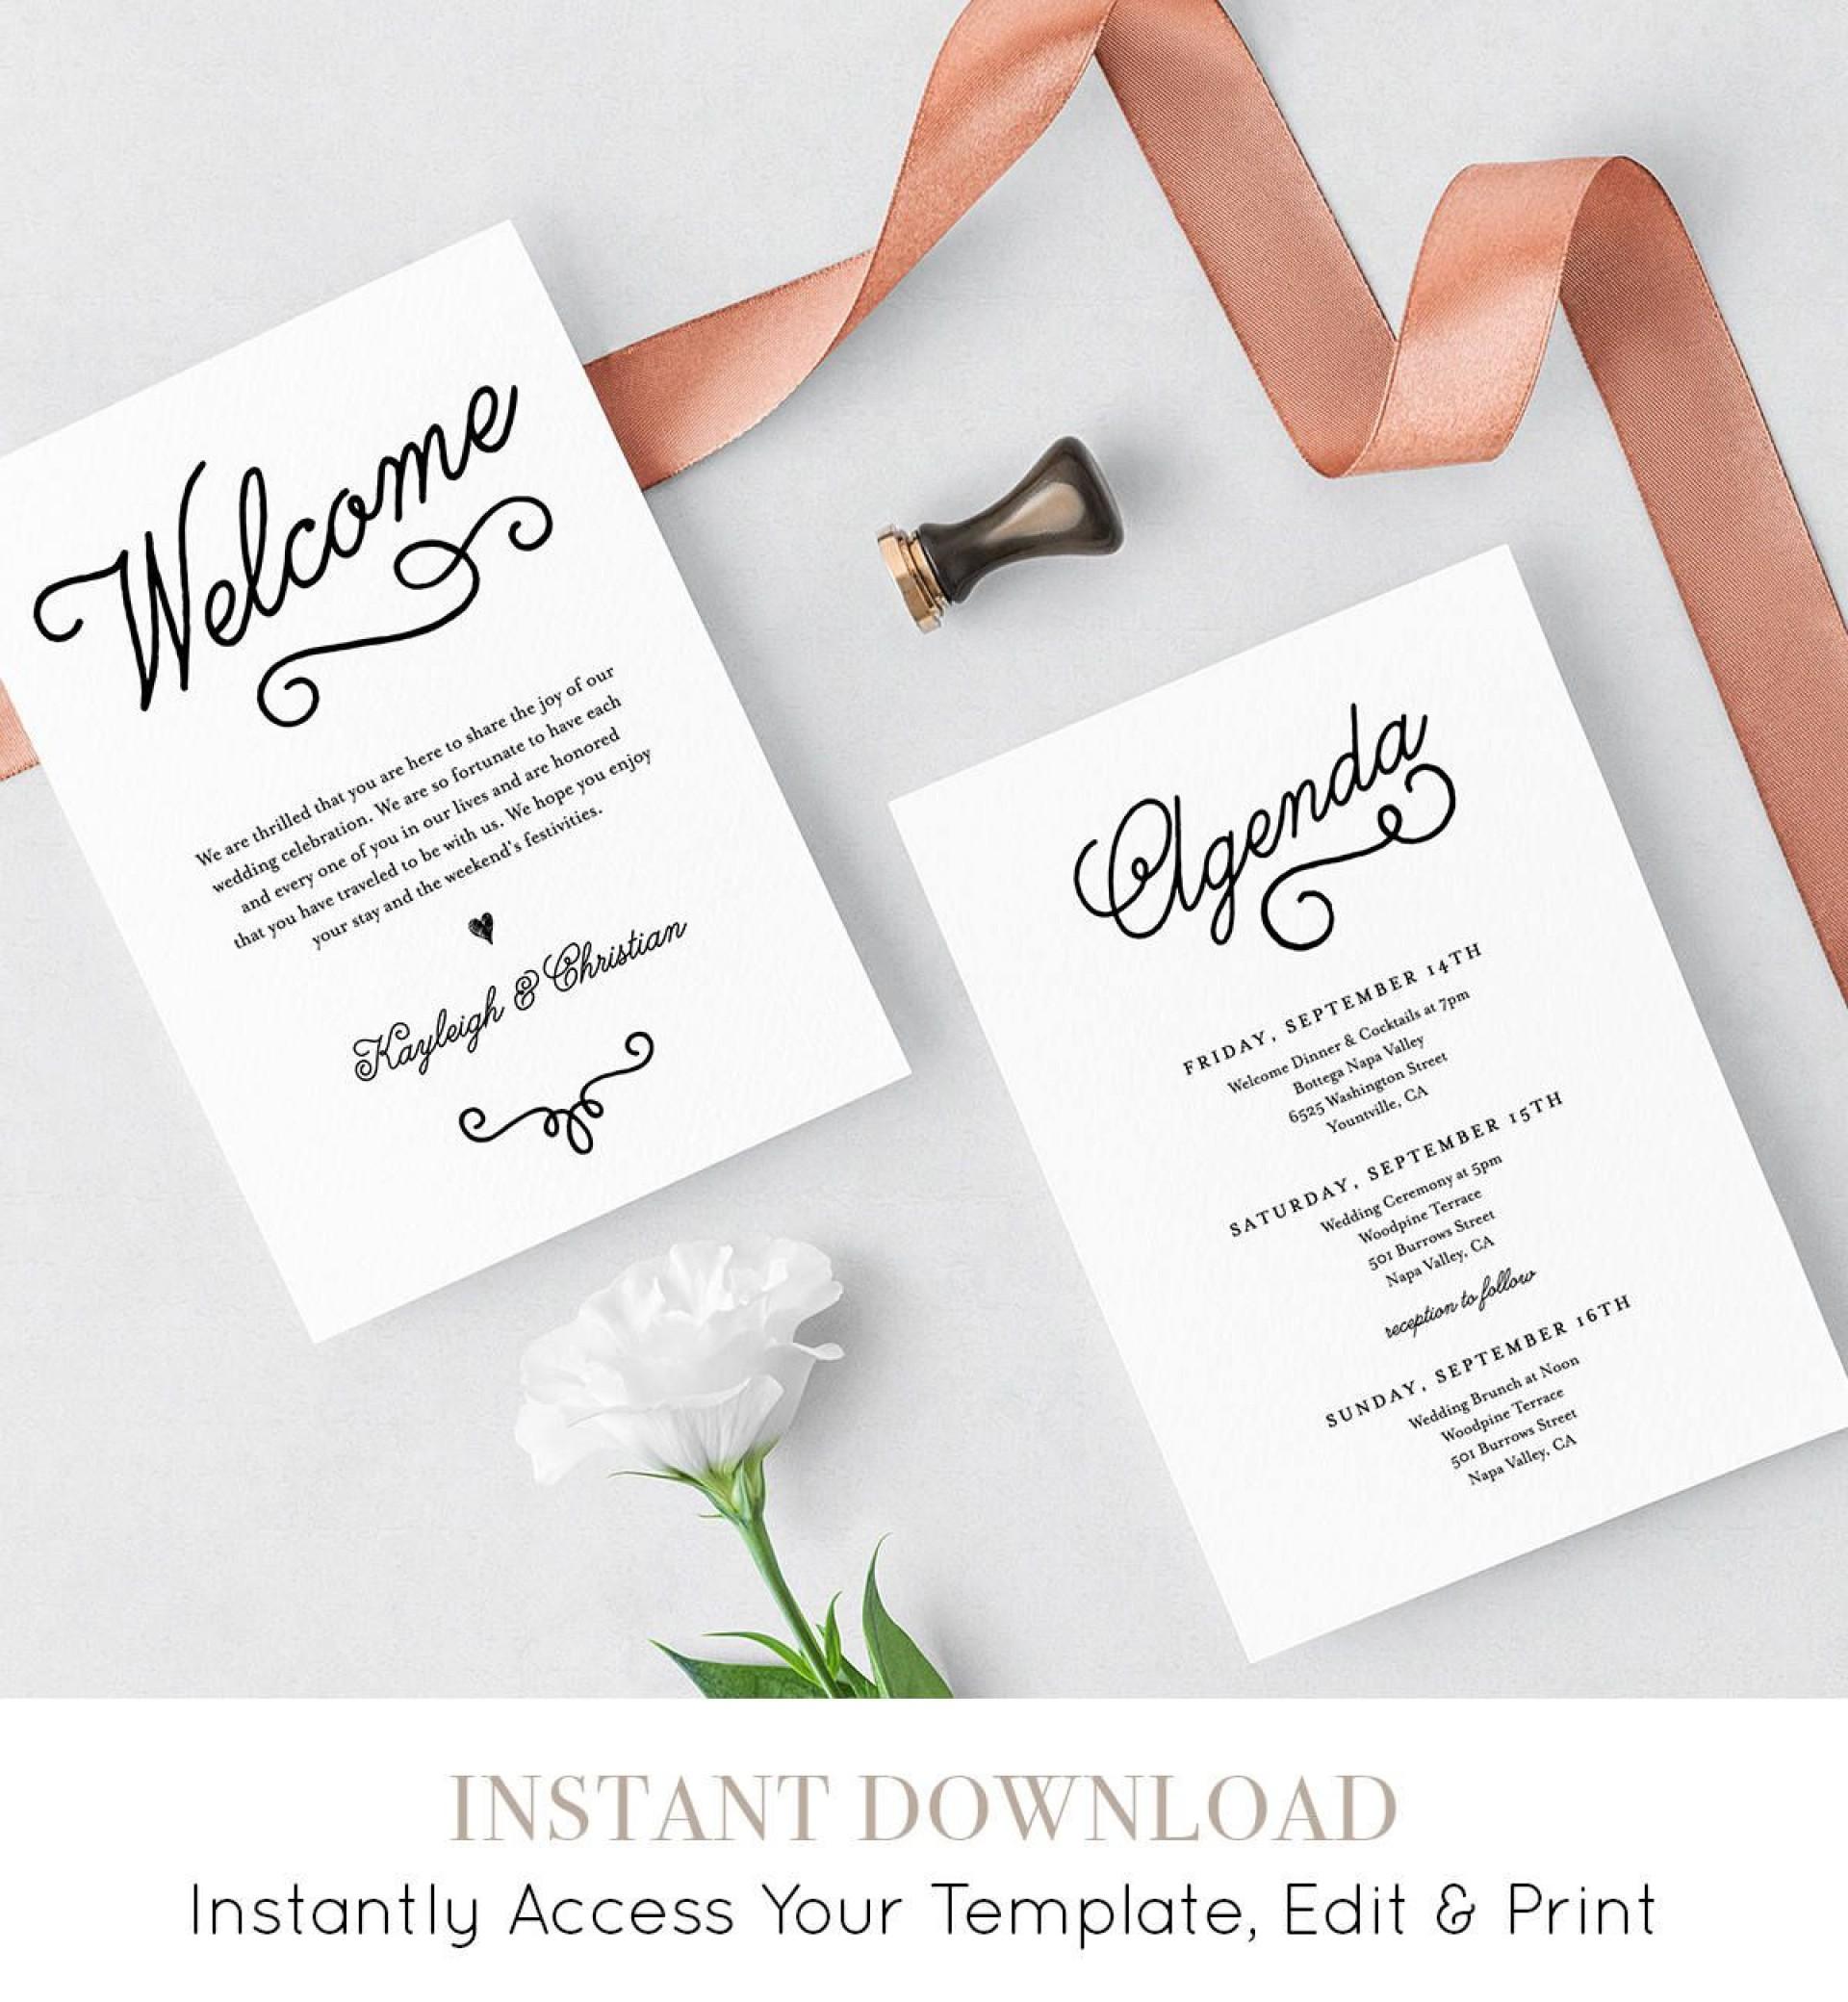 008 Sensational Wedding Welcome Bag Letter Template Free Highest Quality 1920